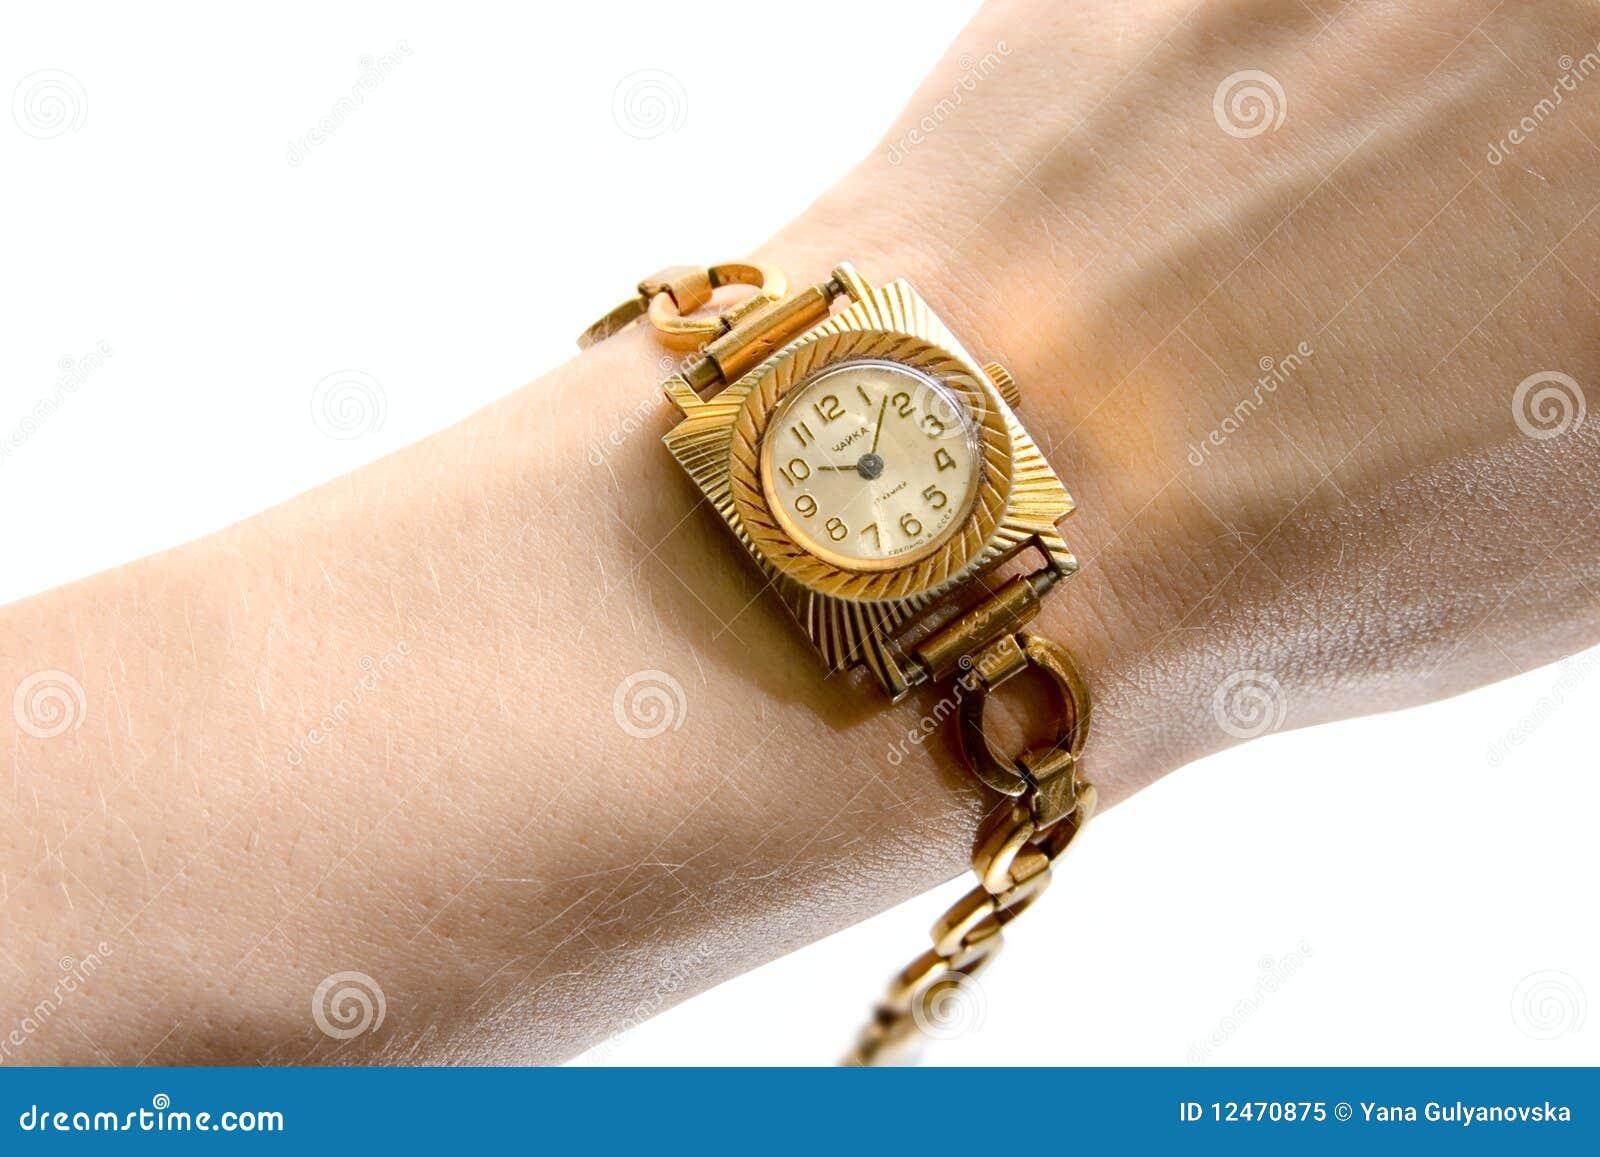 Soviet Wrist-watch On Human Hand Royalty Free Stock Photo ...